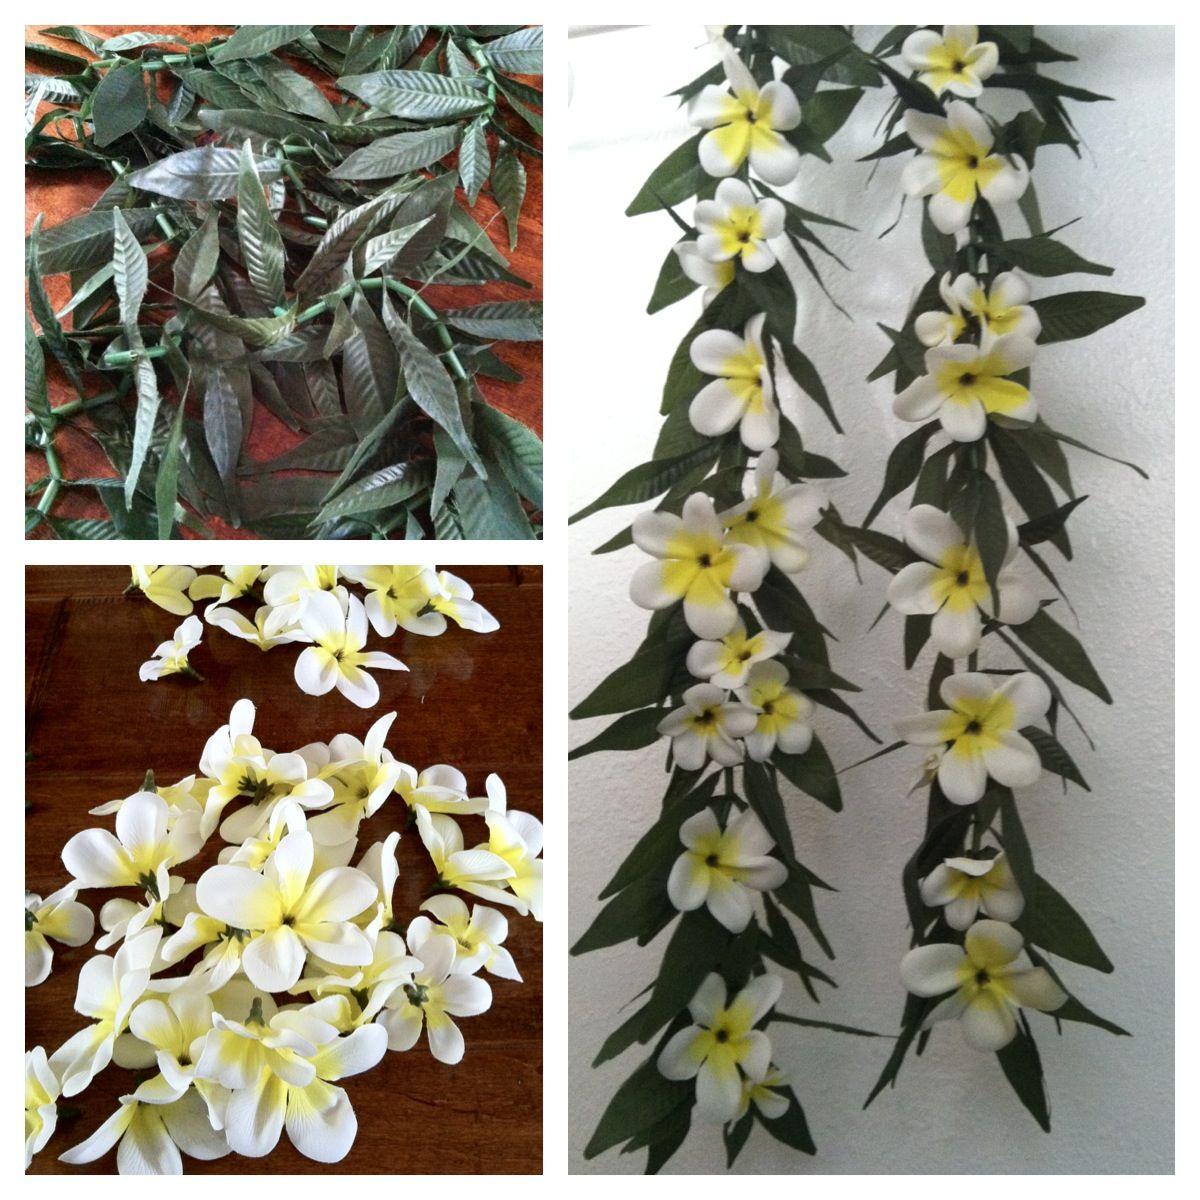 Graduation lei ti leaf inspired shawl made with silk plumeria graduation lei ti leaf inspired shawl made with silk plumeria flowers flowers purchased mightylinksfo